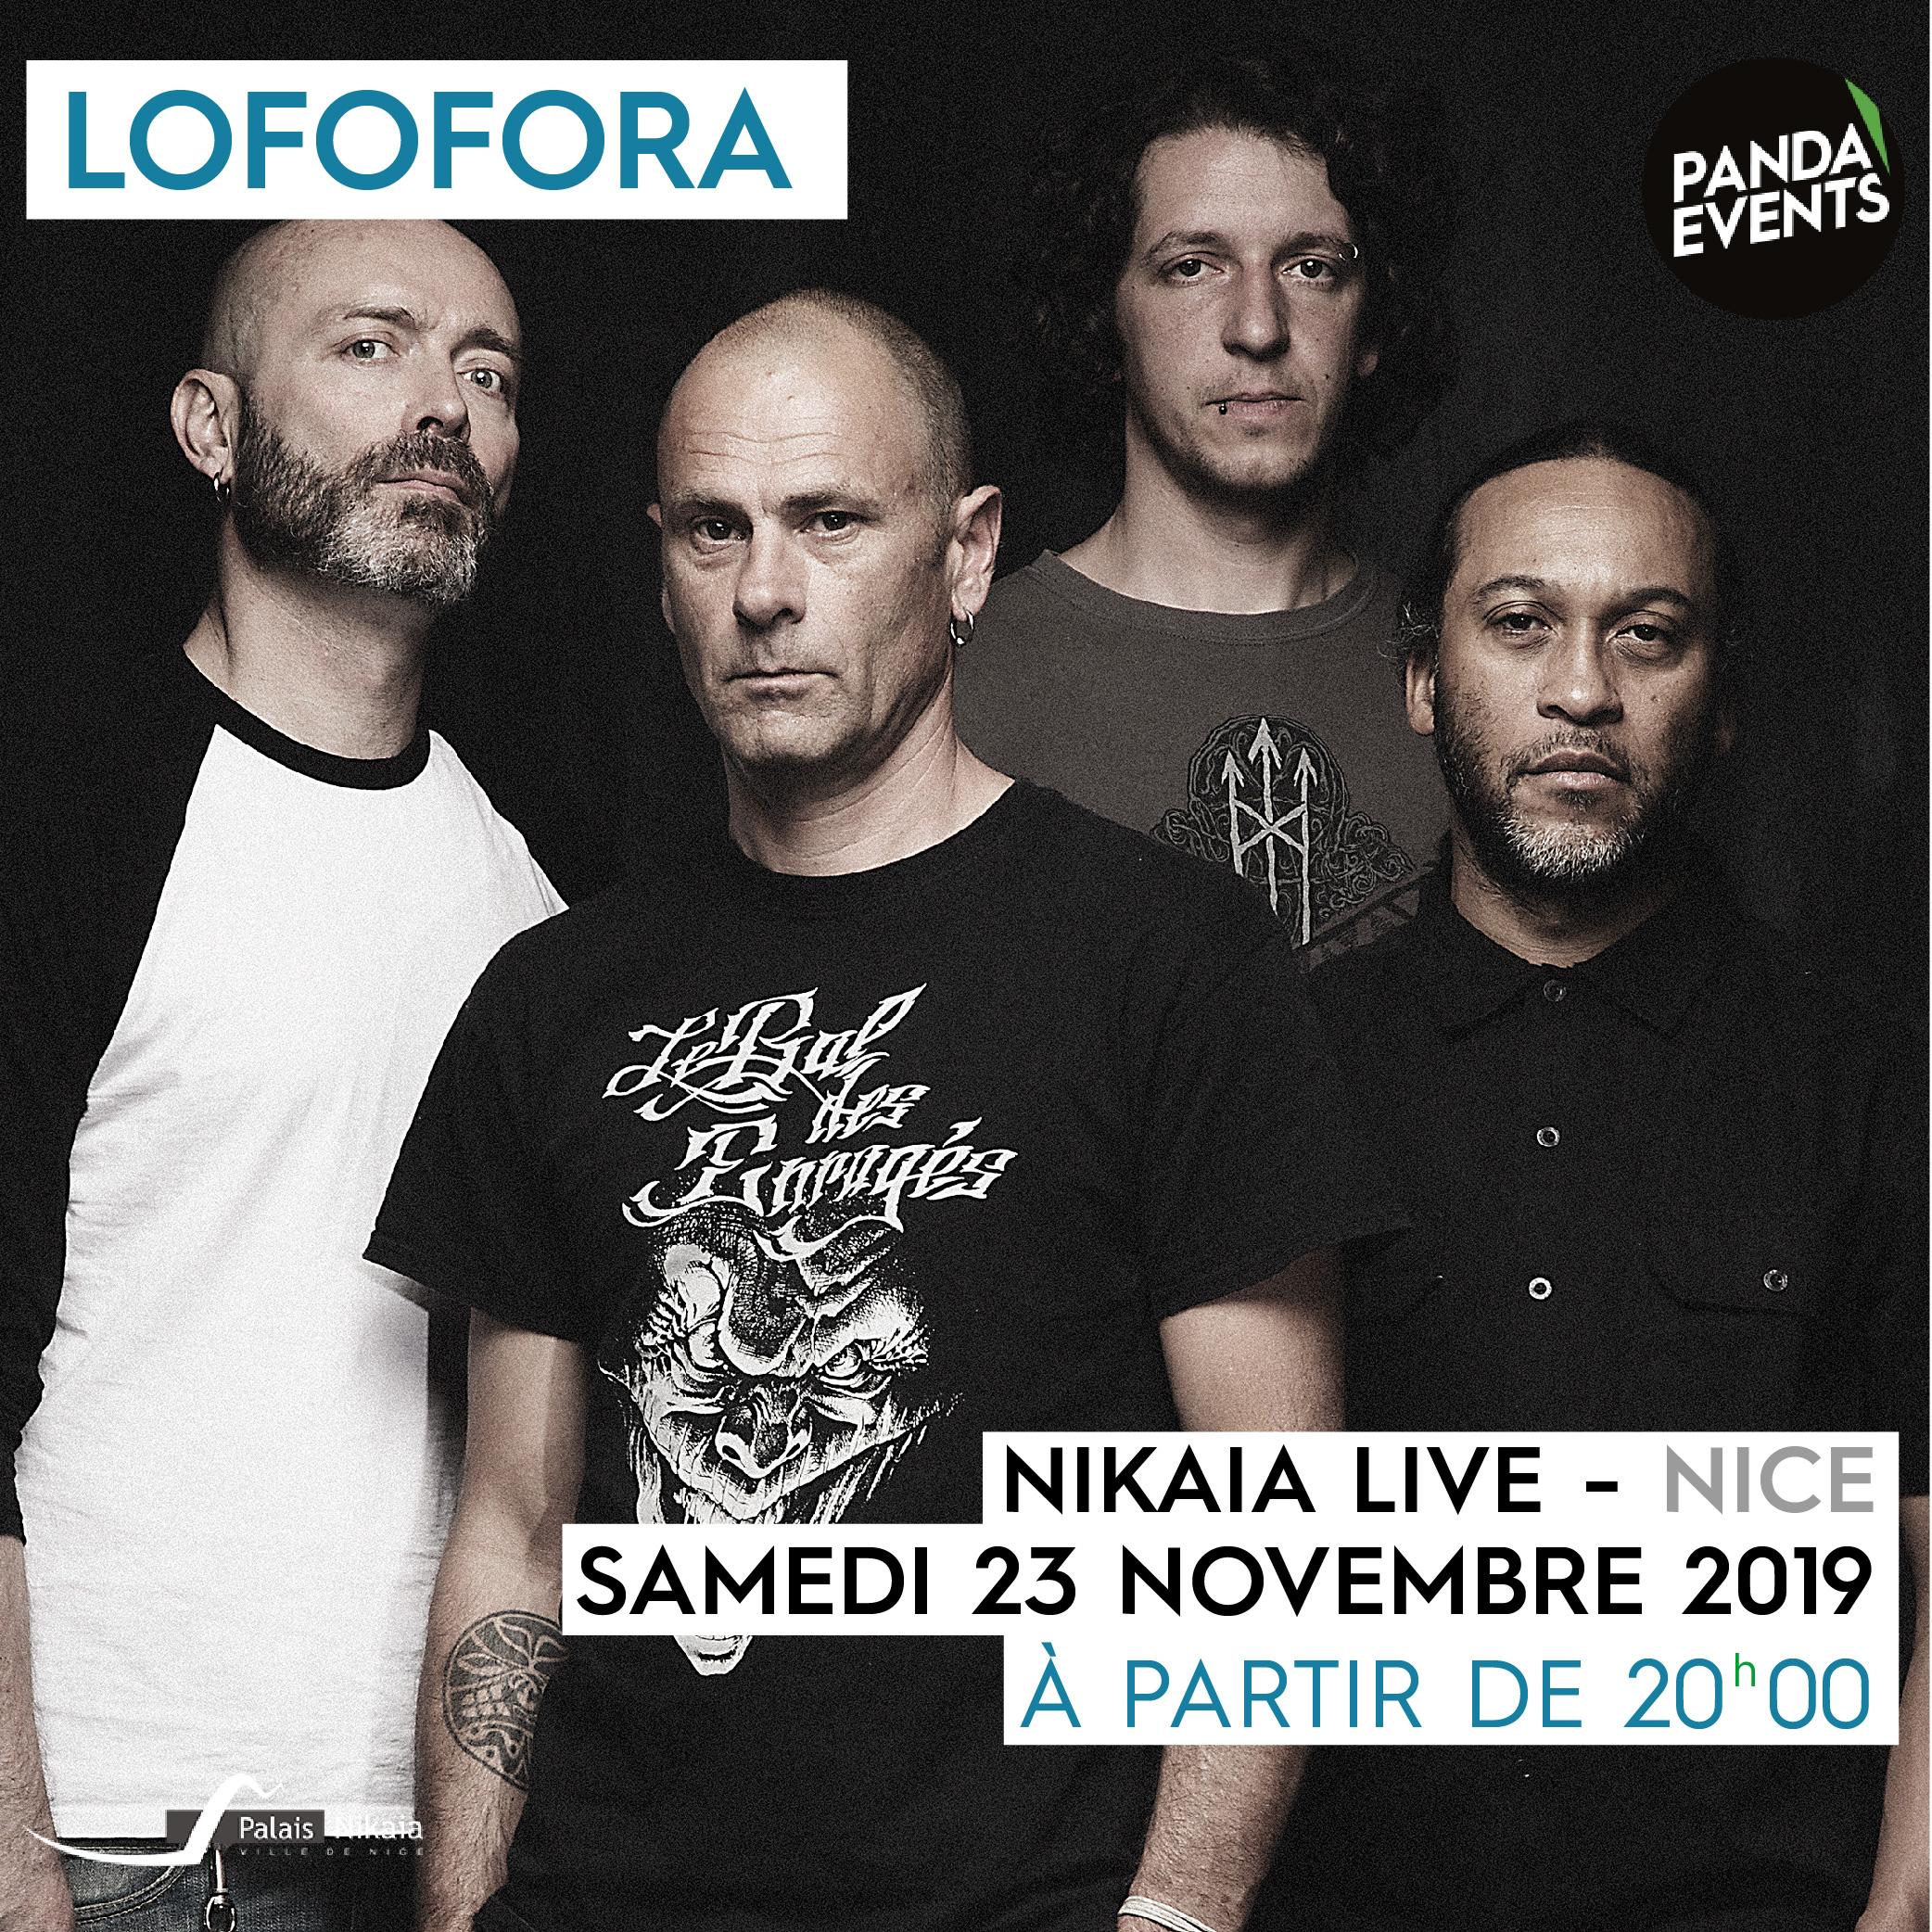 Lofofora + Darktribe